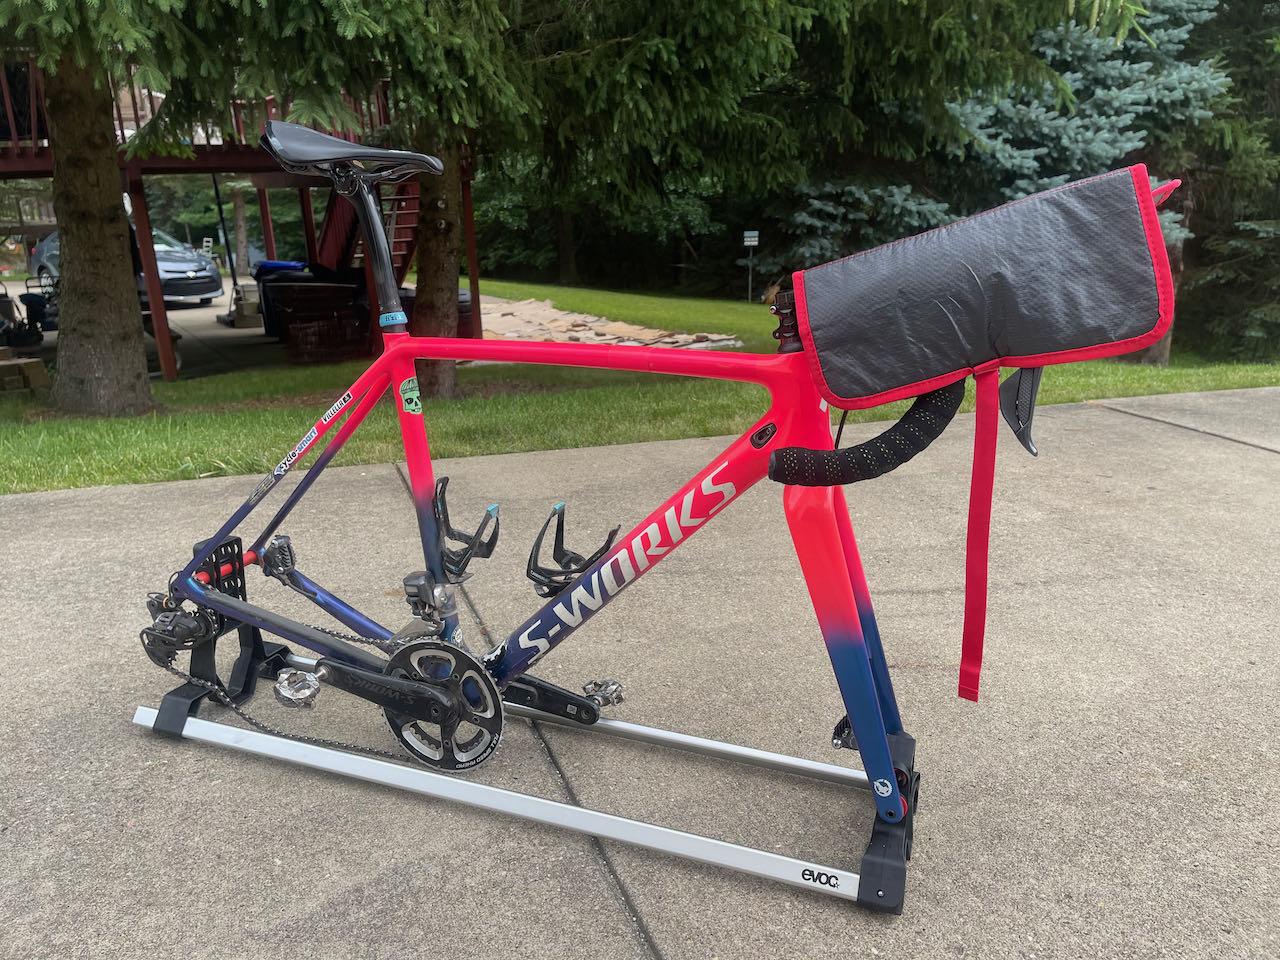 EVOCs Road Bike Bag Pro hadle bar padding installed